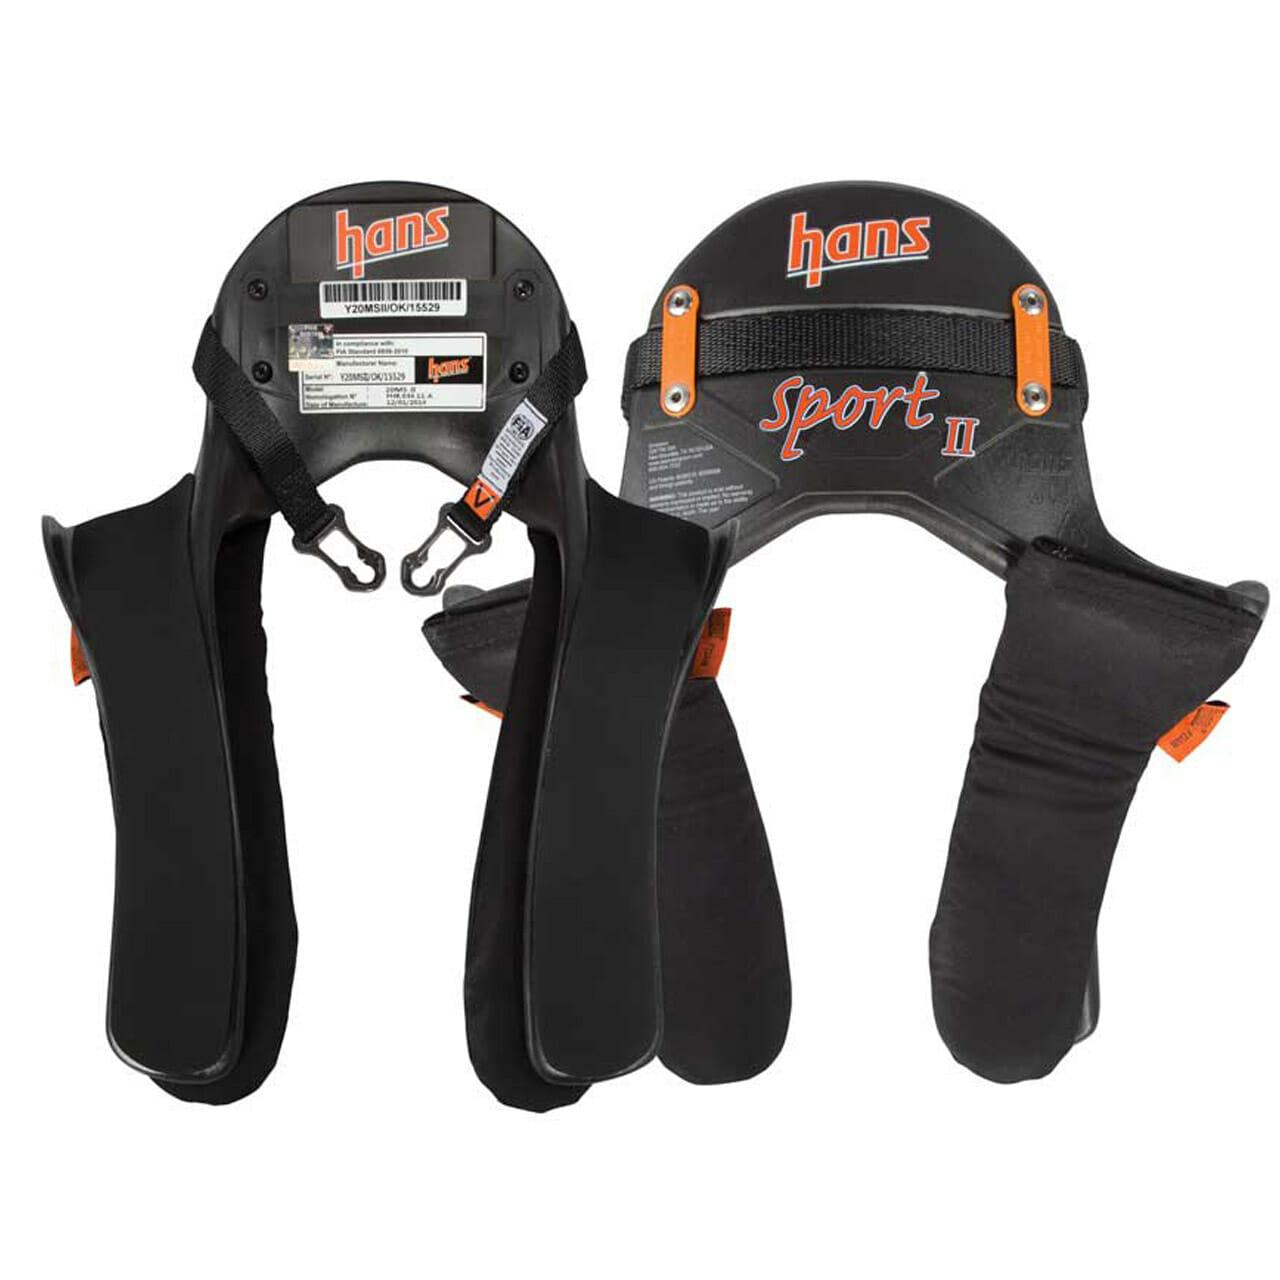 HANS Sport 2 Device